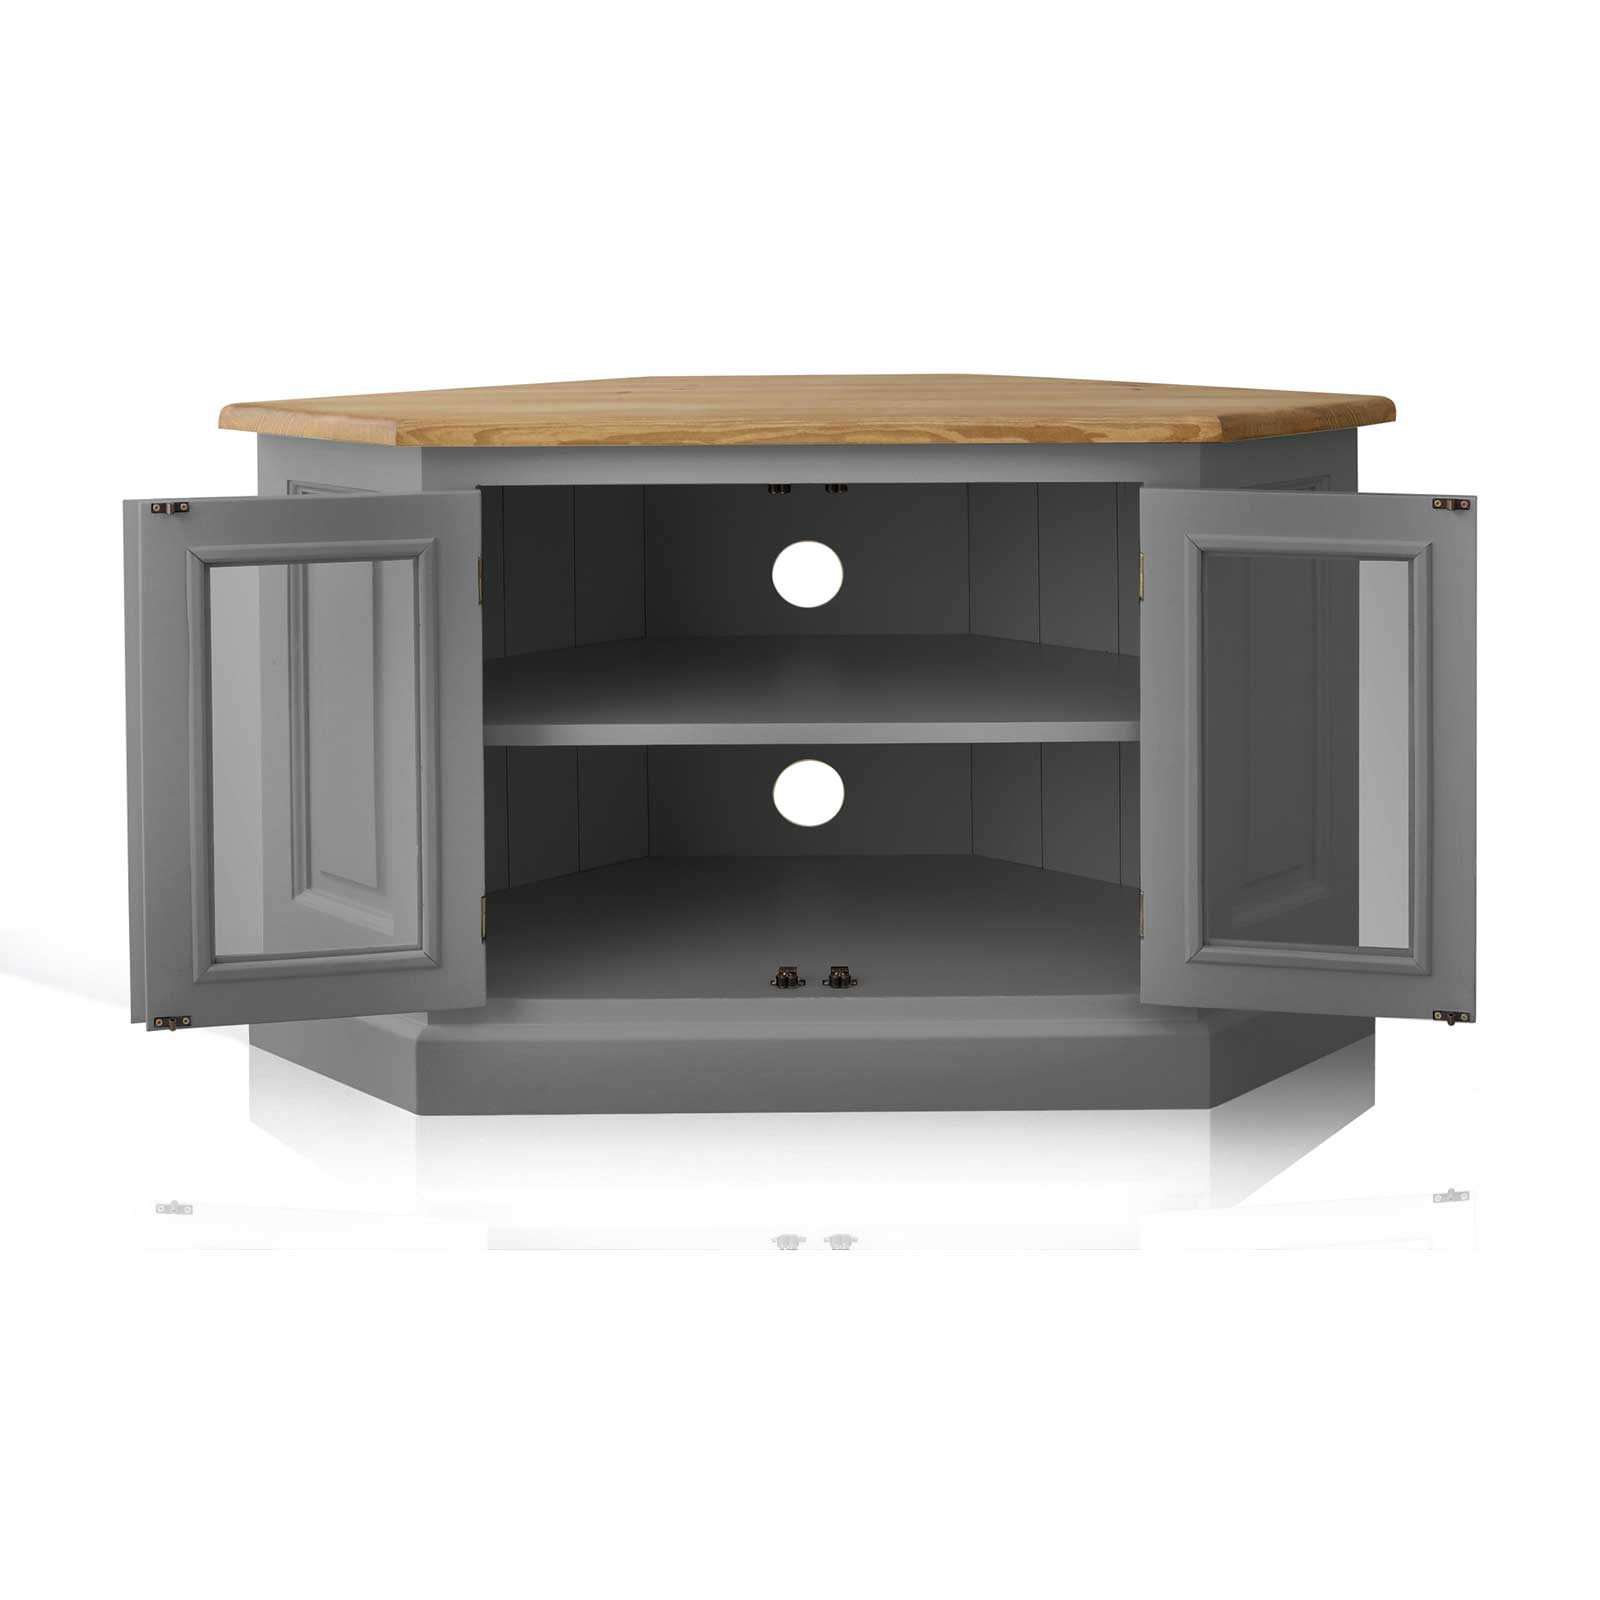 Tv Stands Costco Gray Tone Stand Cabinet With Doors Grey Corner Regarding Well Known Grey Corner Tv Stands (View 17 of 20)